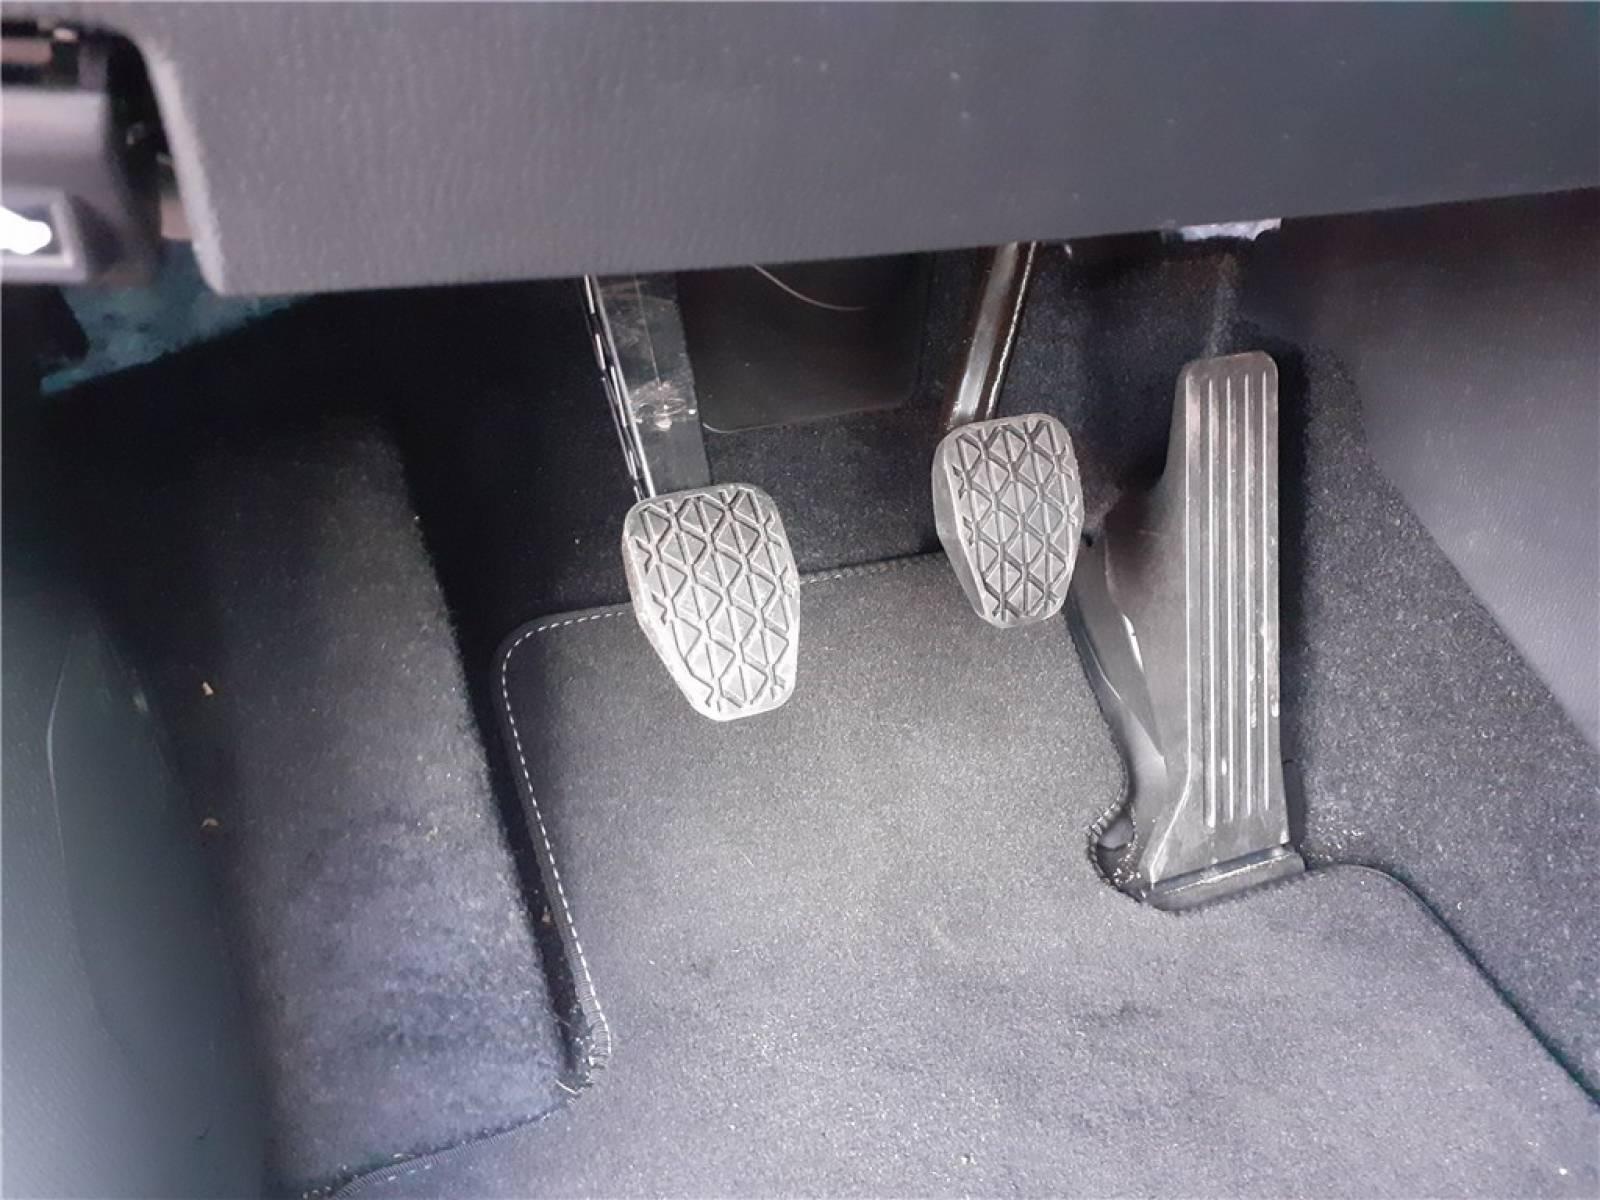 MAZDA Mazda2 1.5L SKYACTIV-G M Hybrid 90ch - véhicule d'occasion - Groupe Guillet - Chalon Automobiles - 71100 - Chalon-sur-Saône - 19